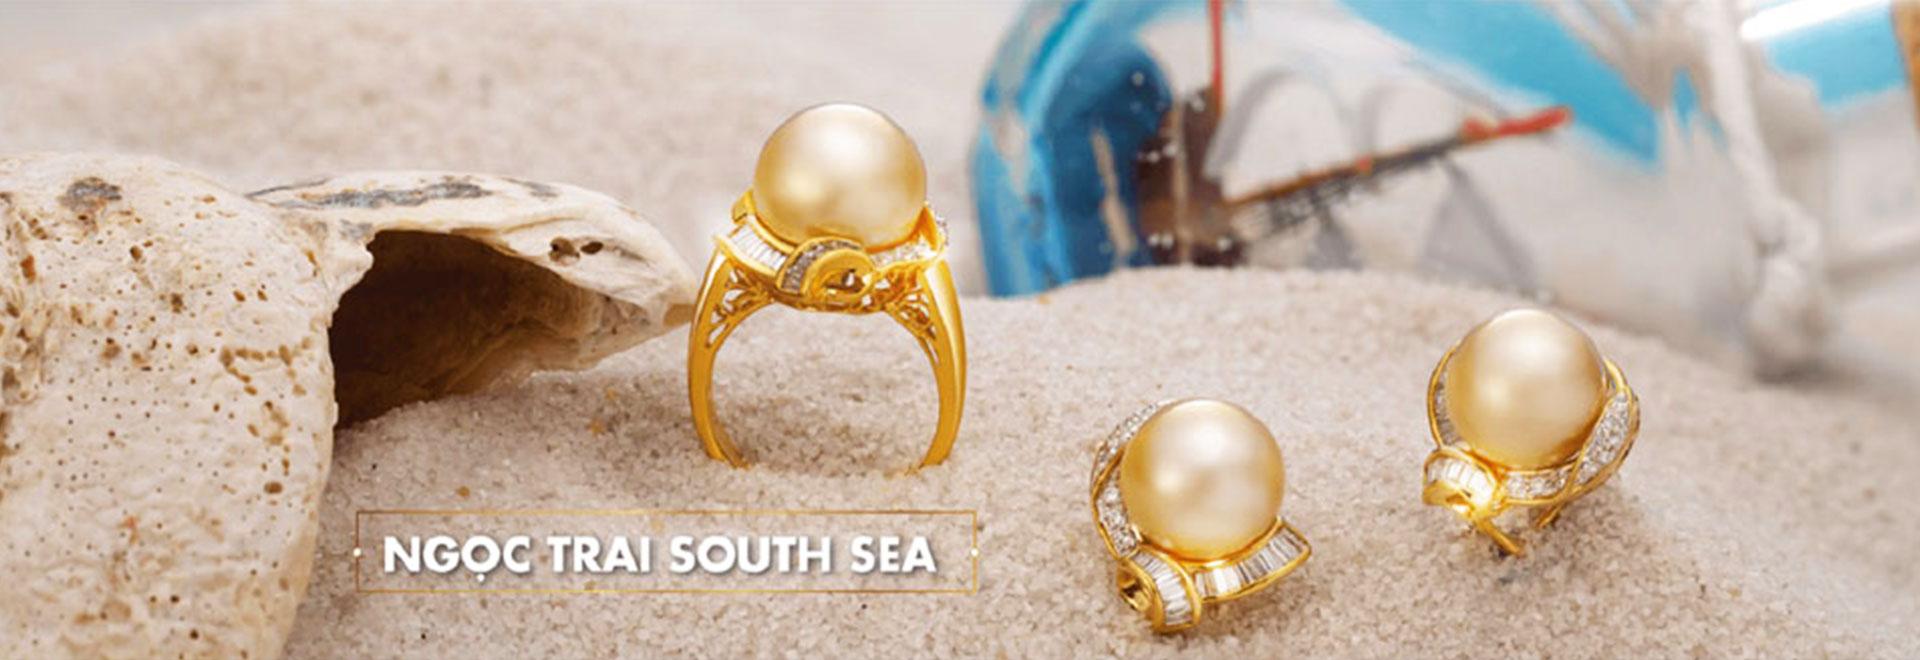 ngoc-trai-long-beach-pearl-pq-1